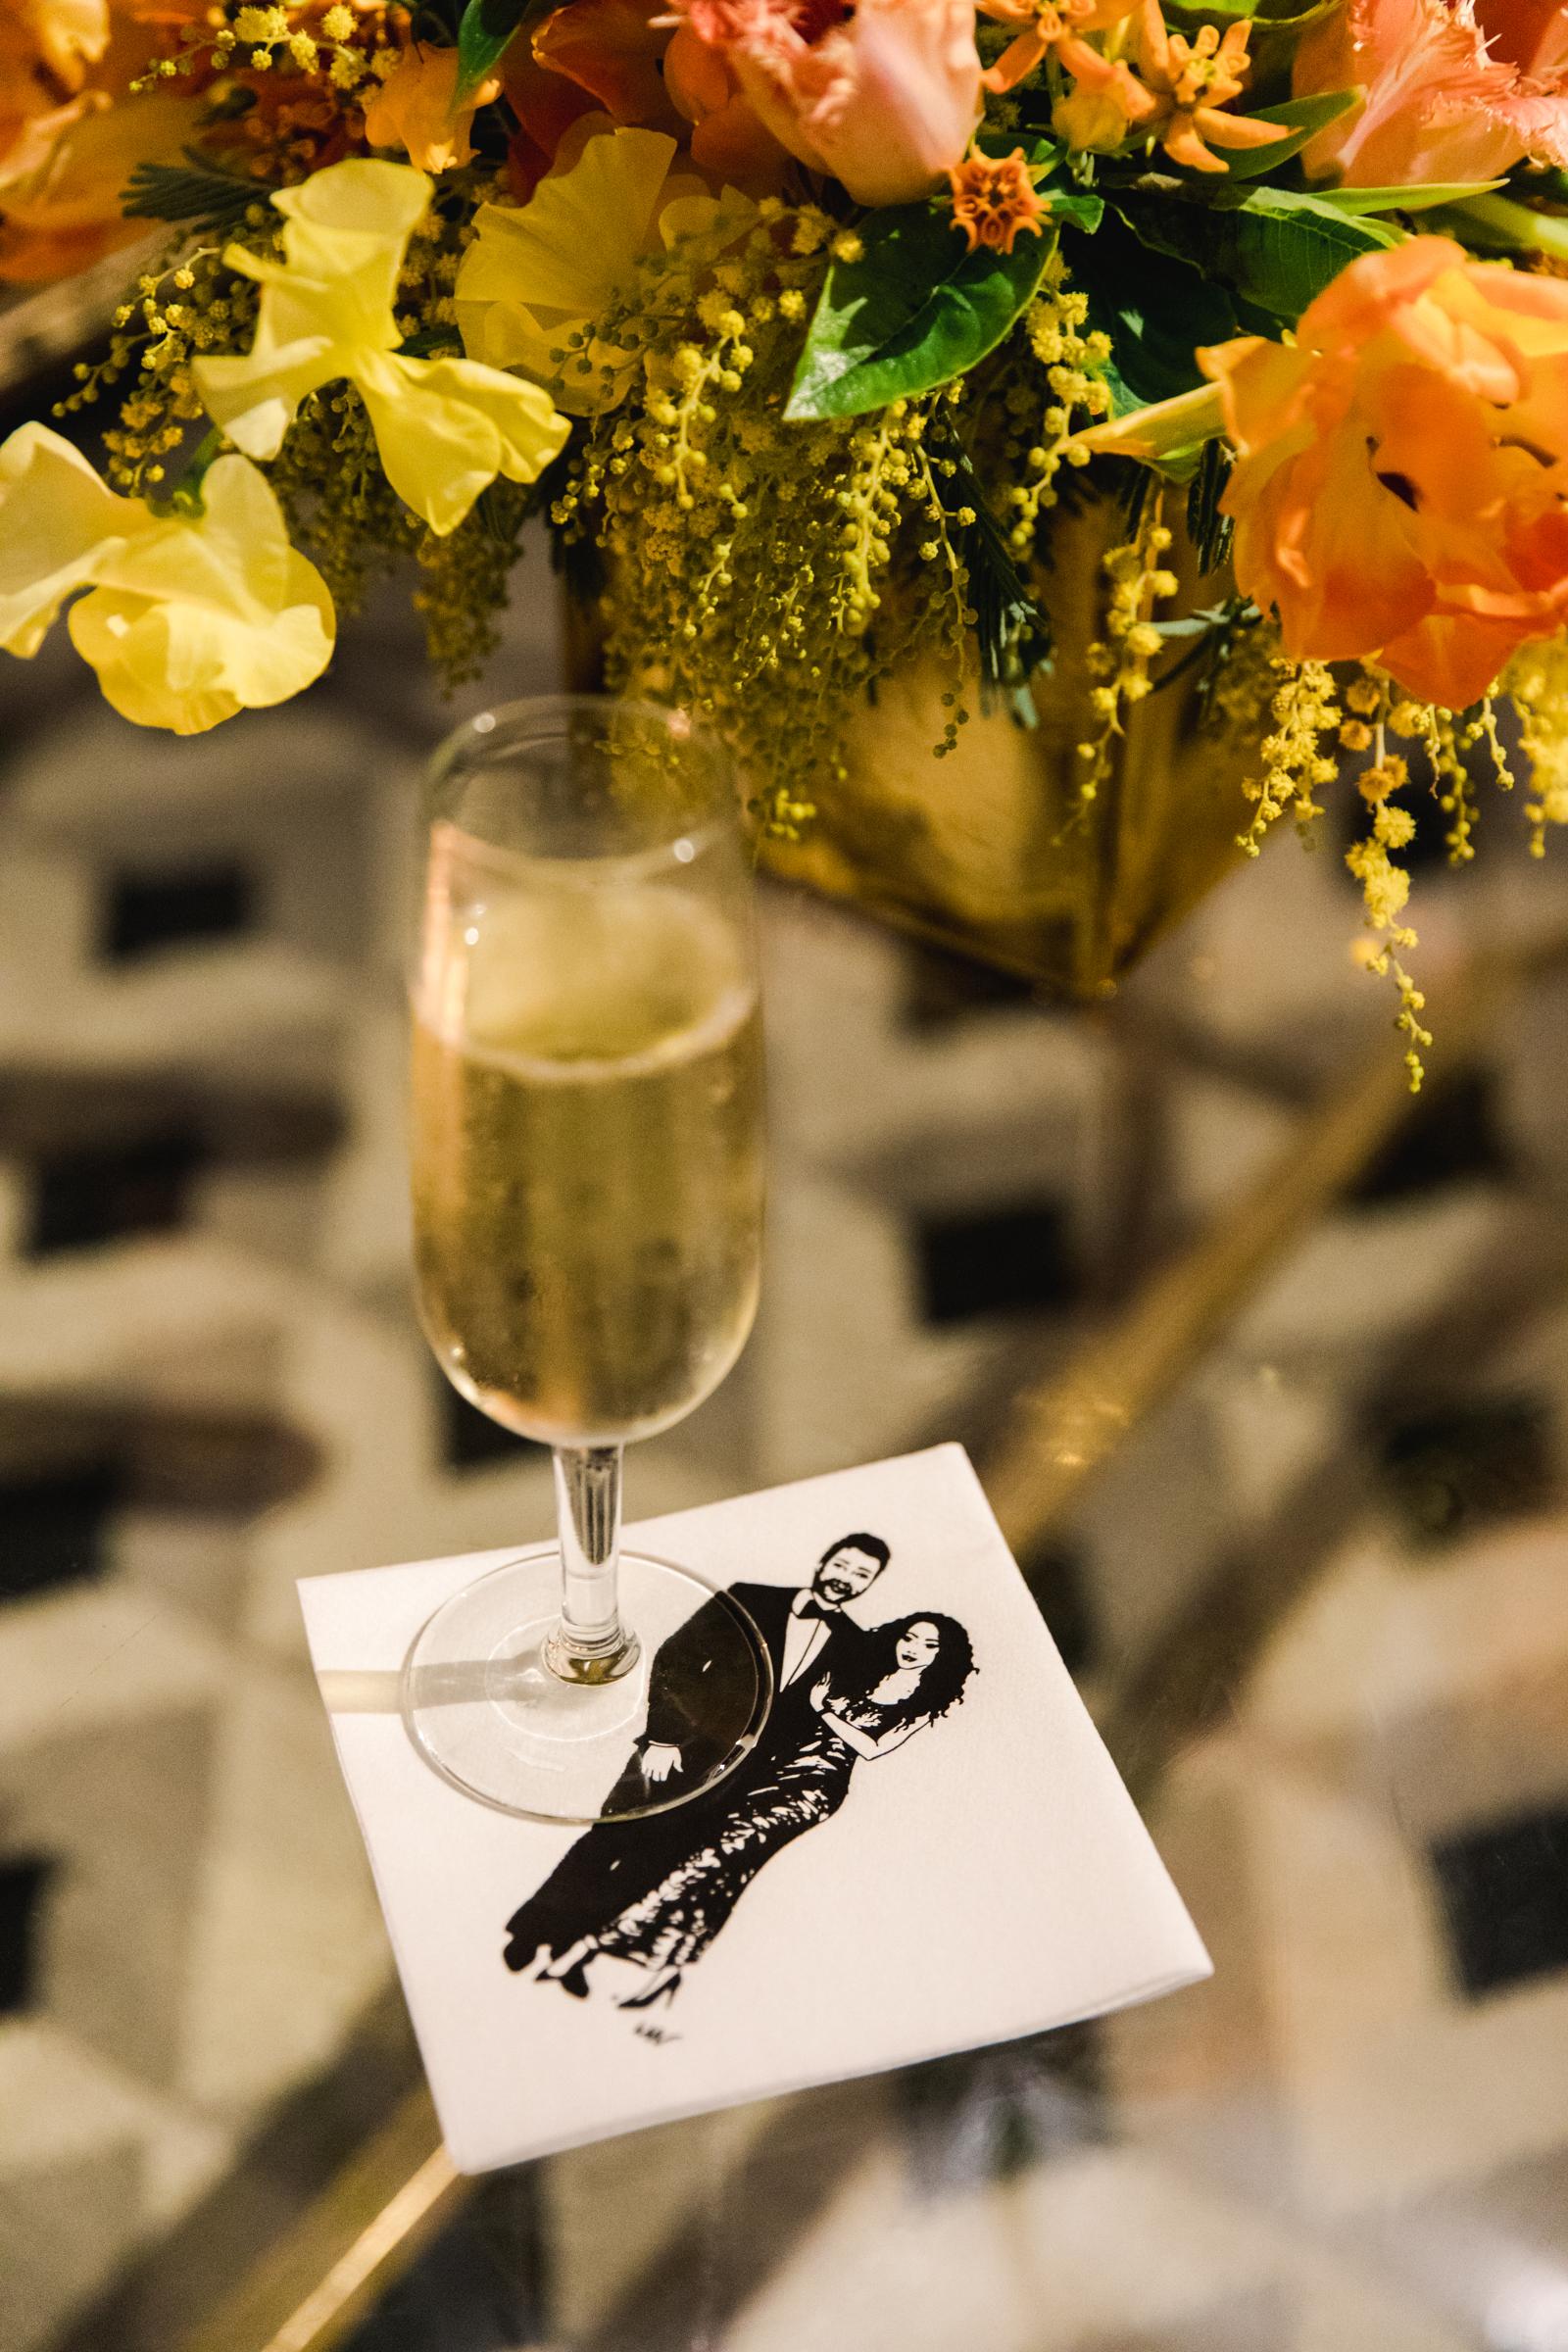 hamida charlie charleson wedding napkin drawing